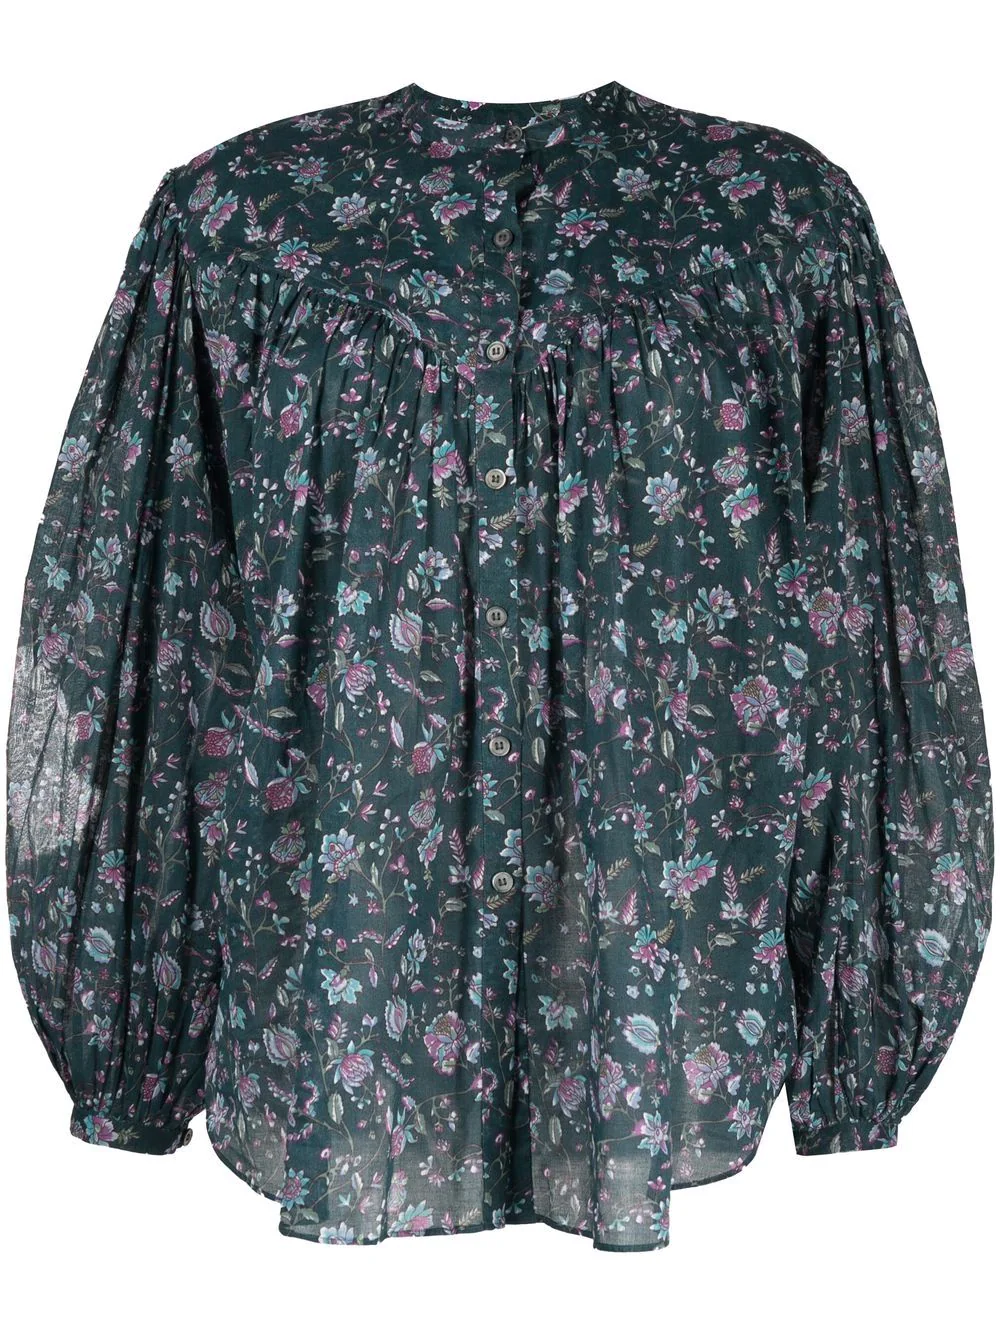 MILEDIA - Bluse mit Blumenmuster